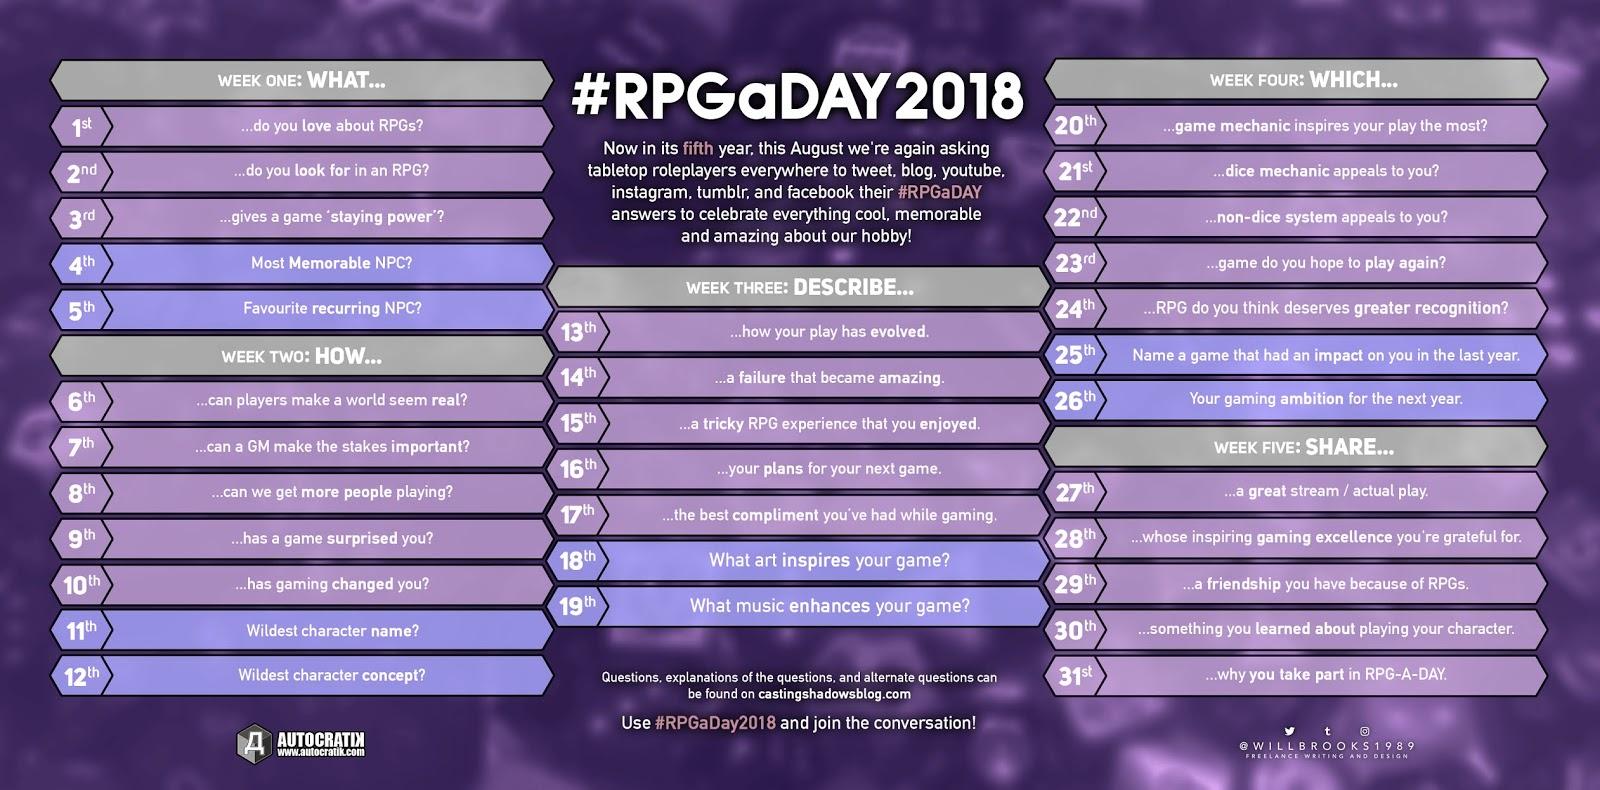 RPGaDay 2018 infographic